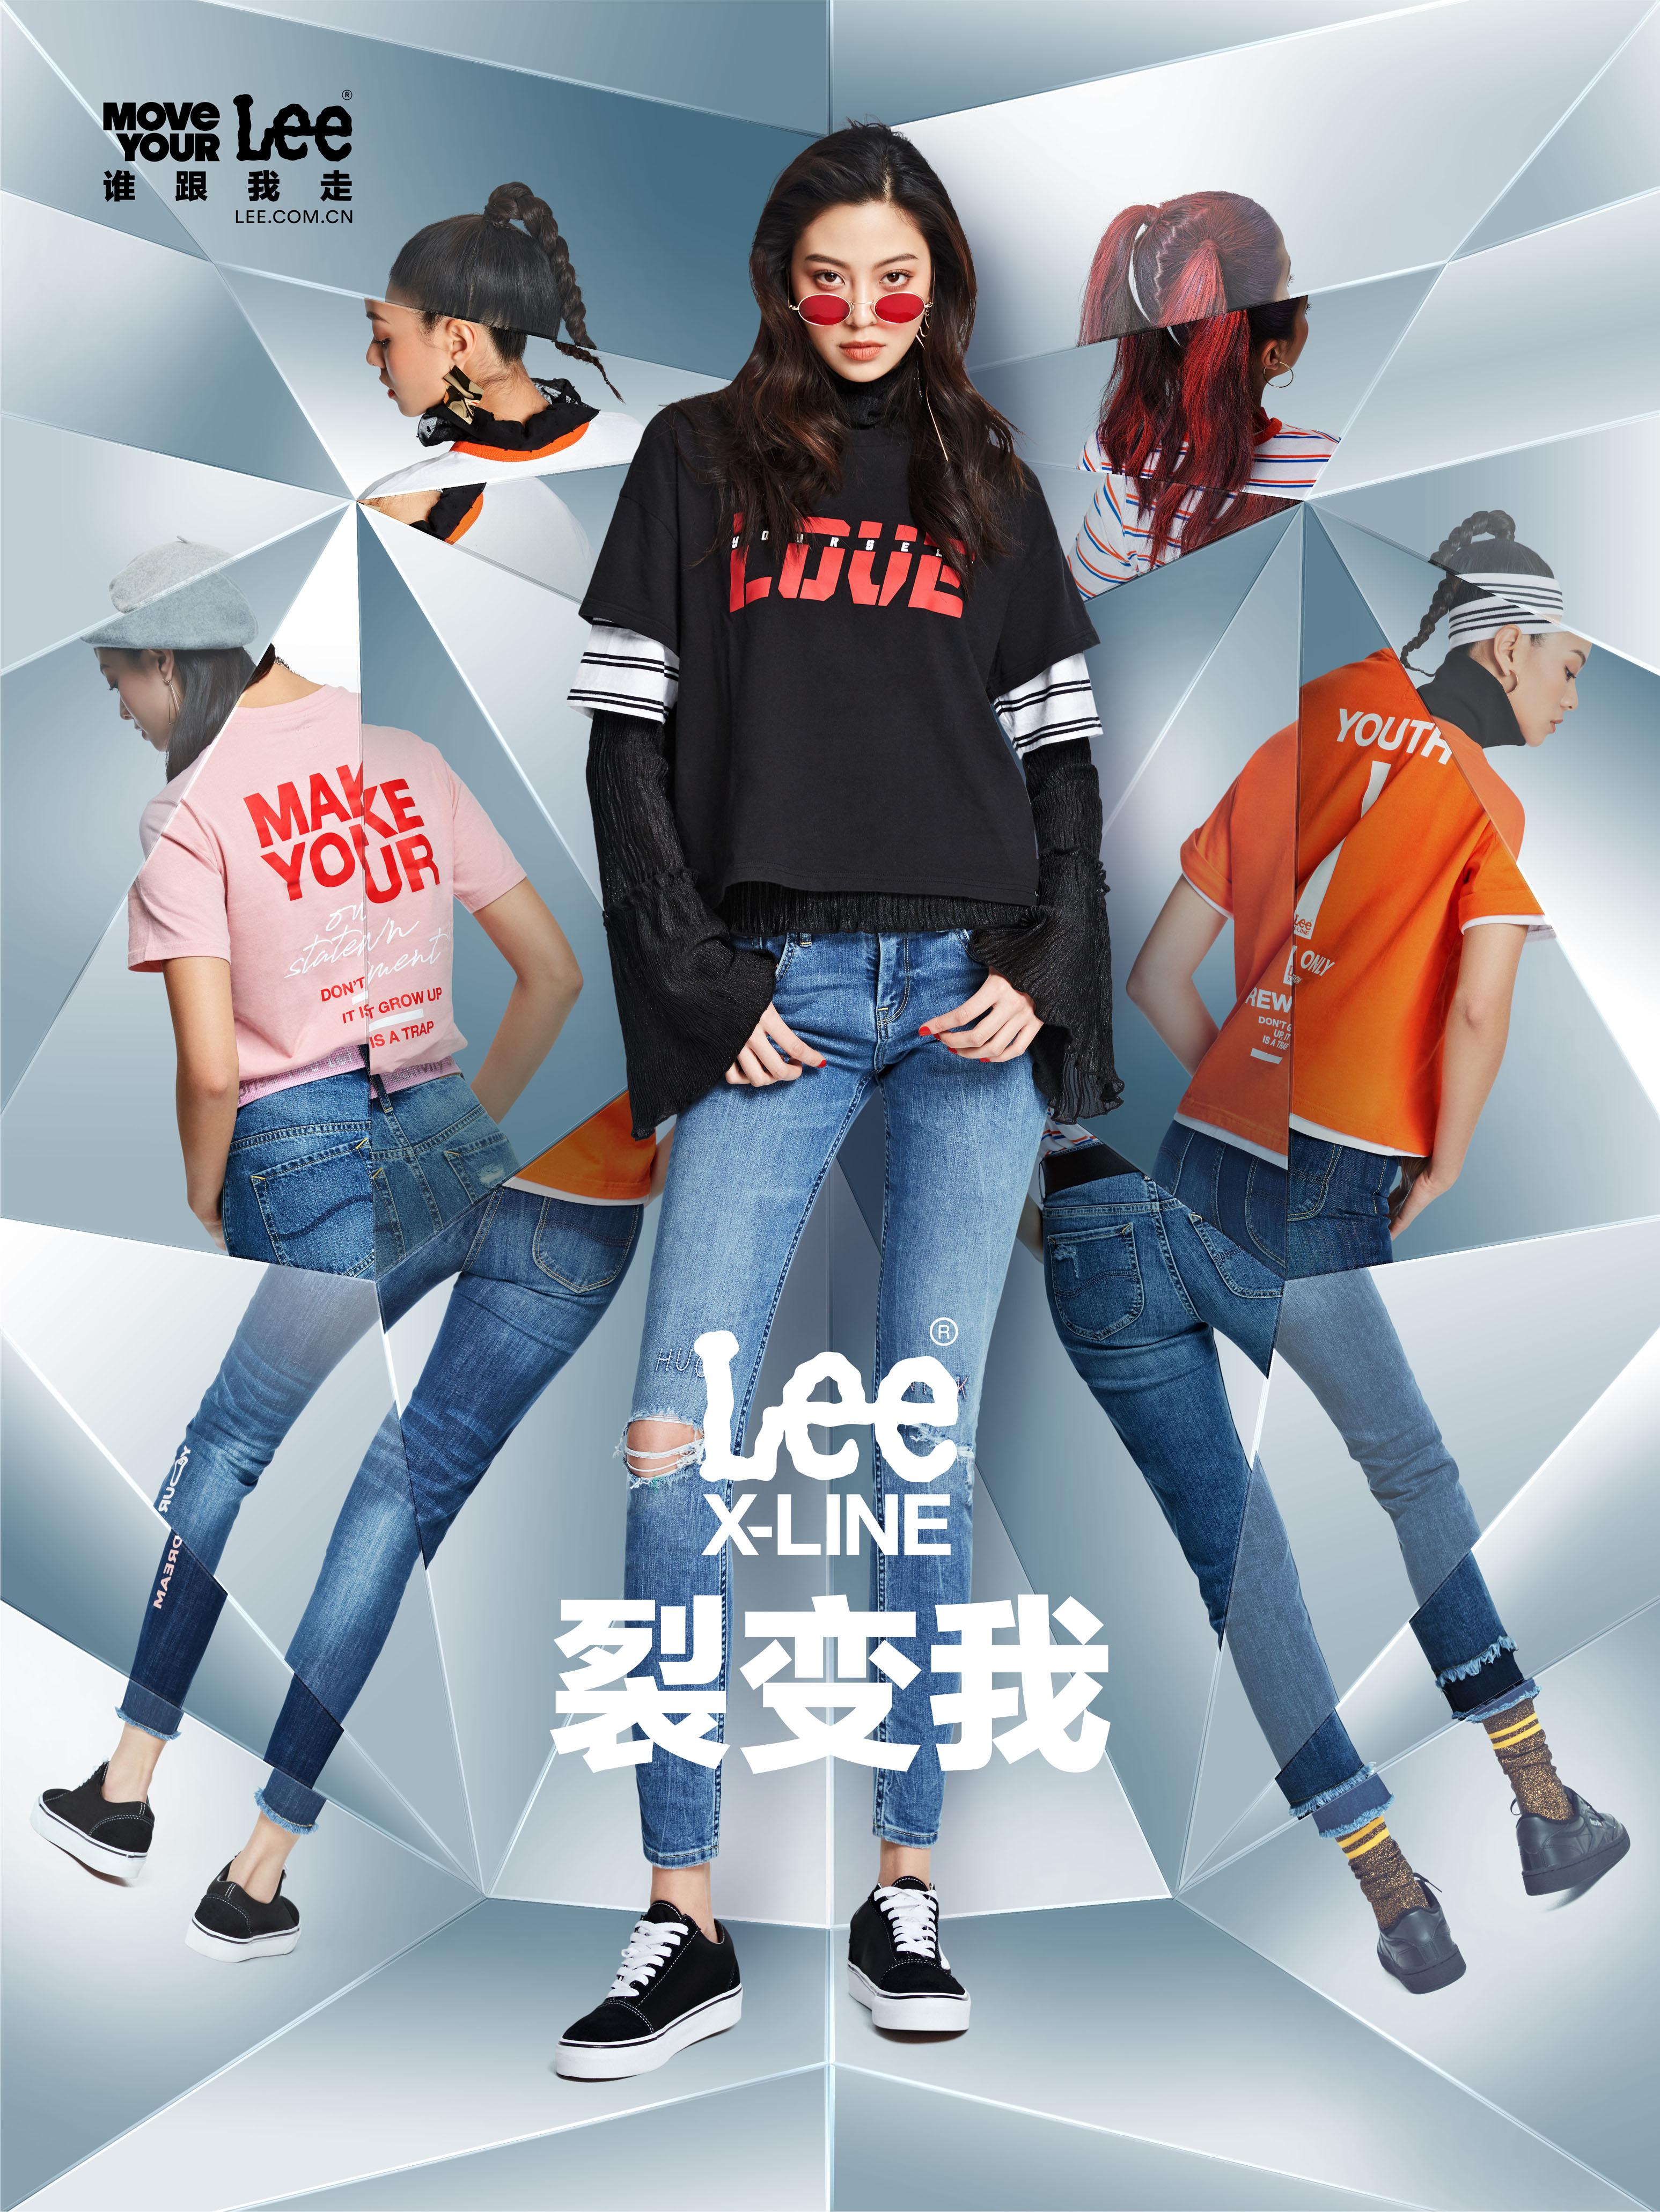 Lee X-LINE 首次进击电商平台